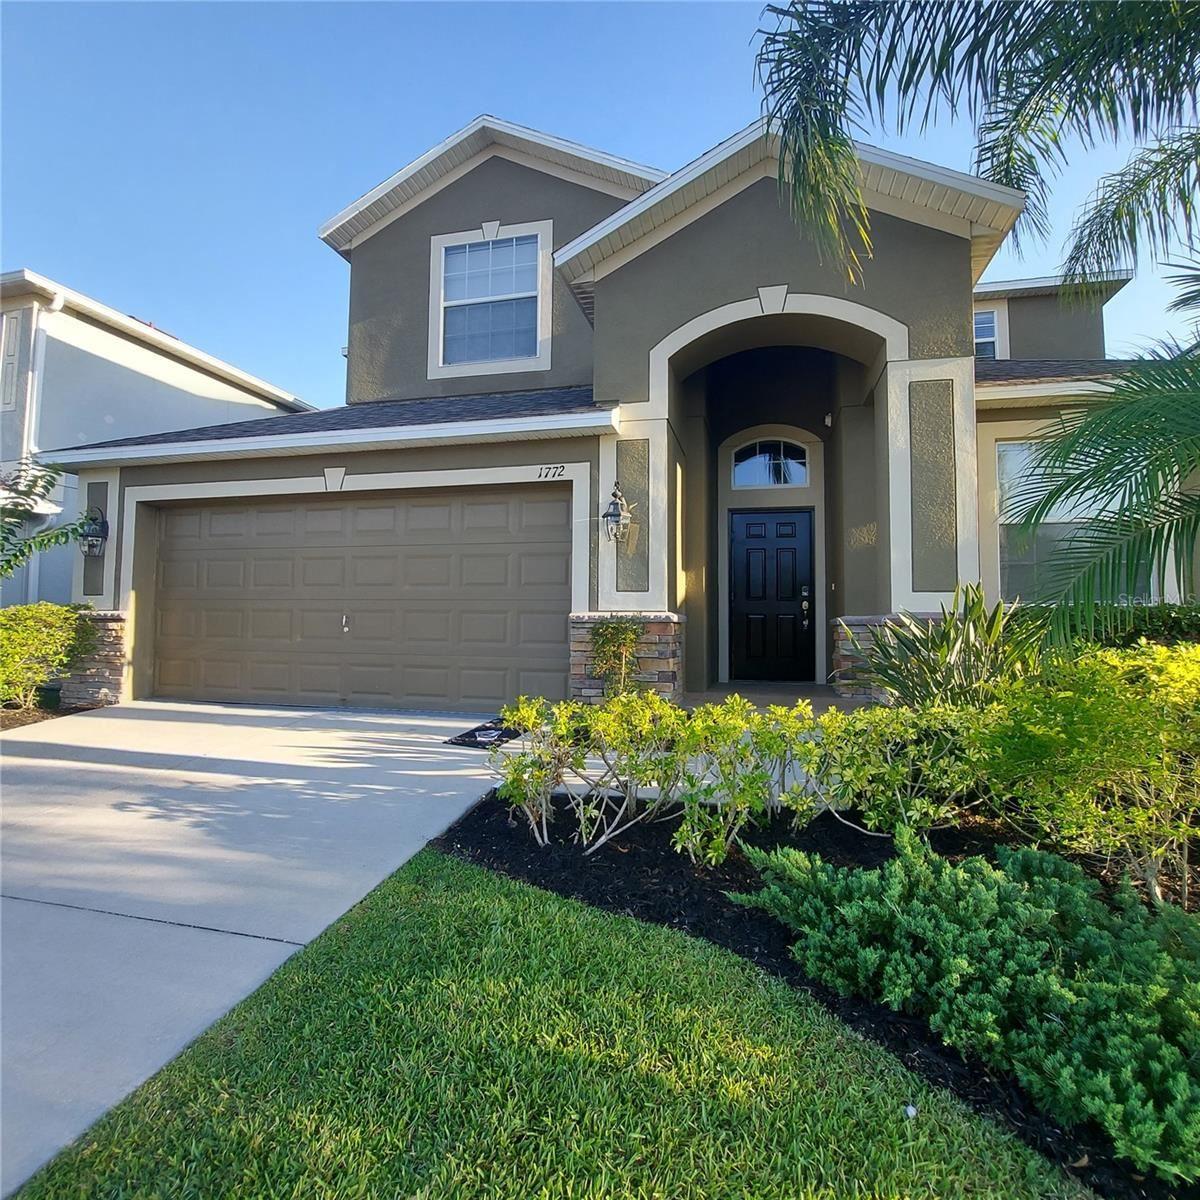 1772 THETFORD CIRCLE, Orlando, FL 32824 - #: S5049871